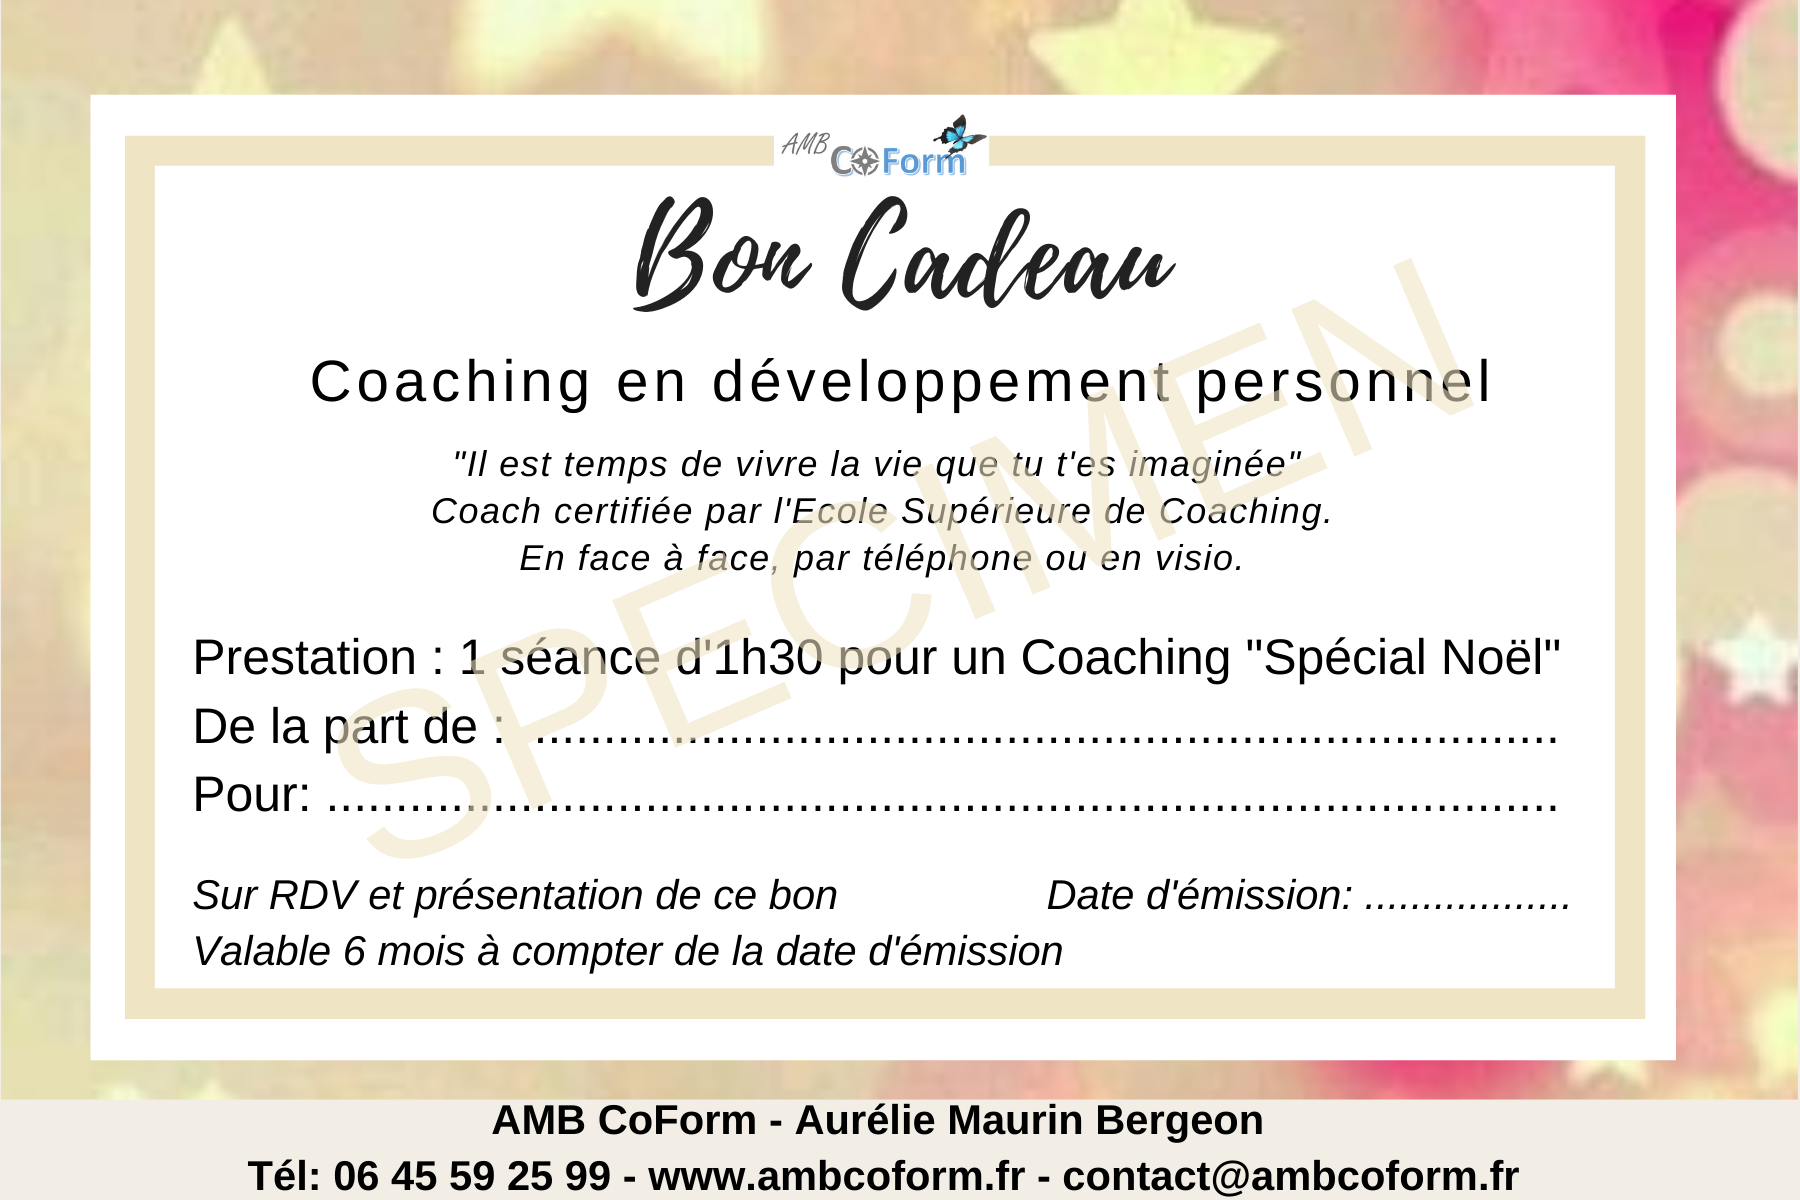 BON CADEAU - Bienvenue - AMB Coform - Aurélie Maurin Bergeon - Coaching - Conseil - Formations